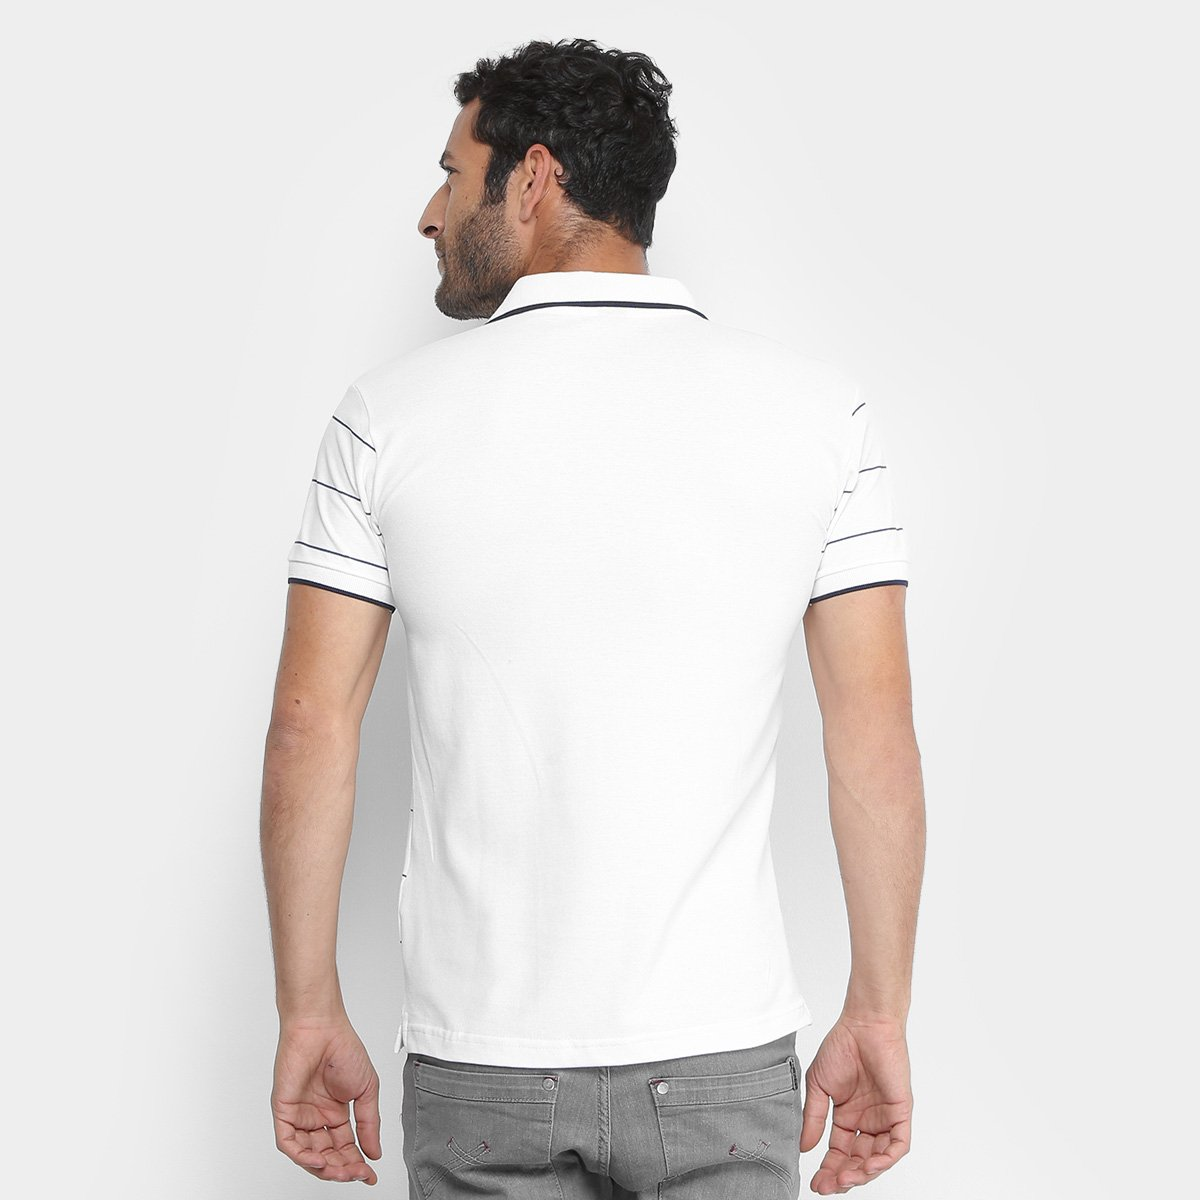 d1dac88a39 ... Camisa Polo em Piquet Estampada Polo RG 518 Manga Curta Masculina ...